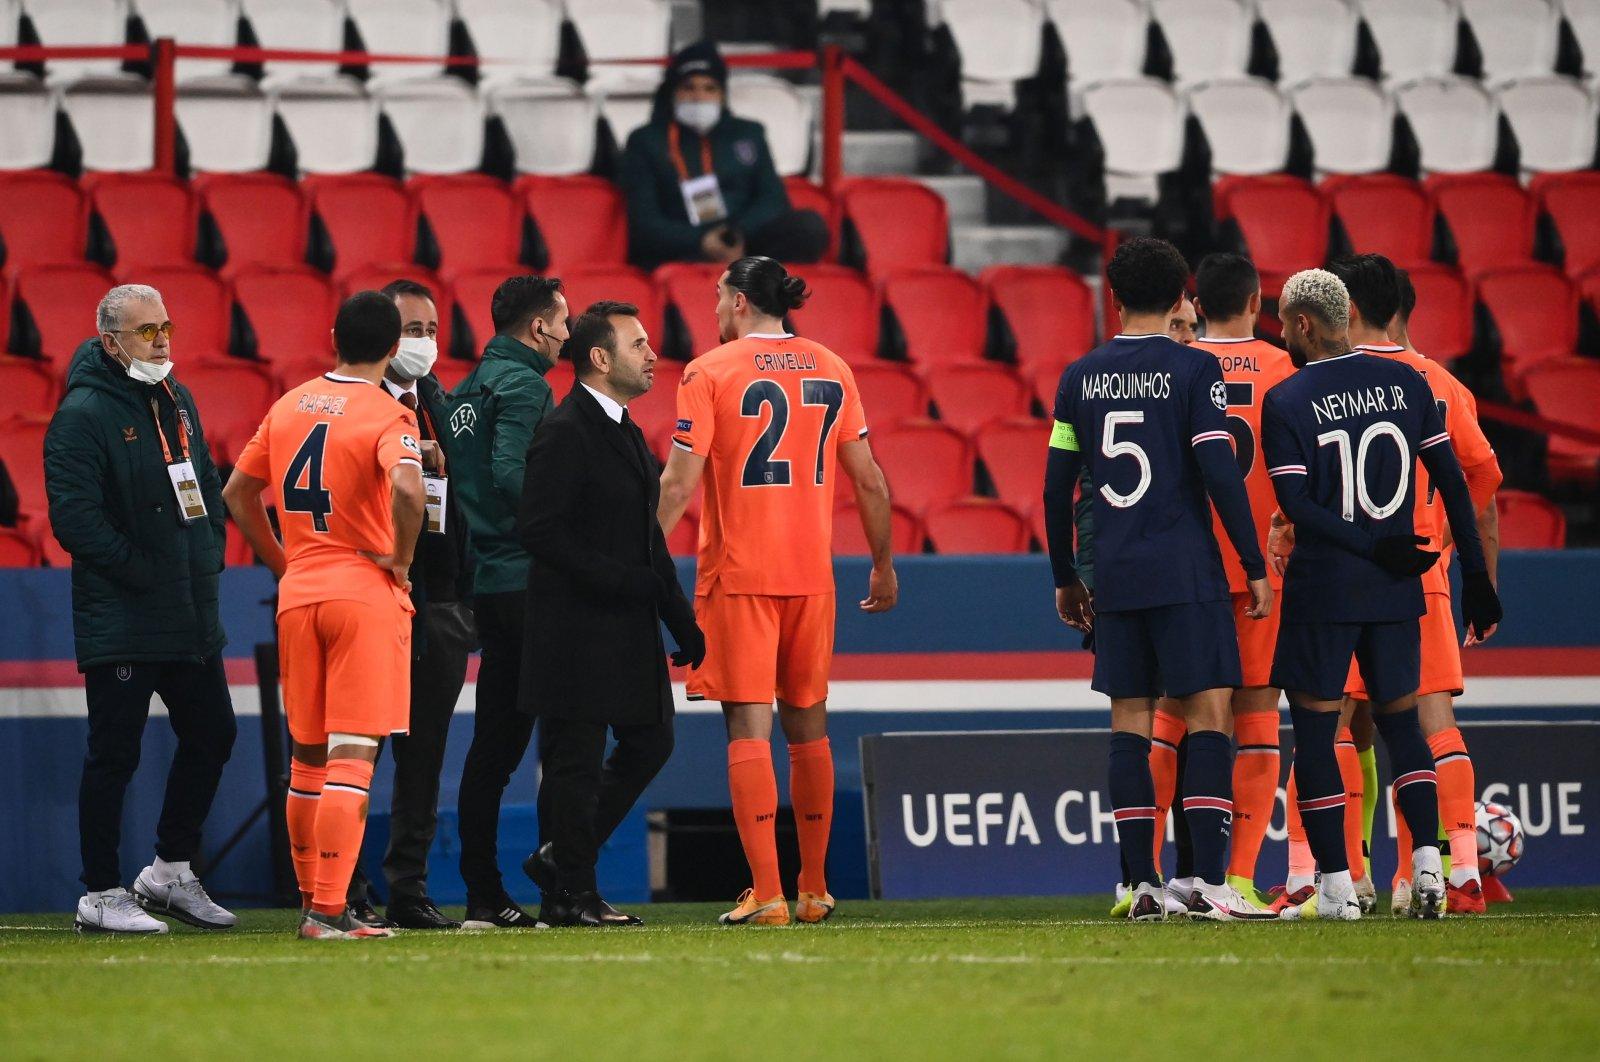 Başakşehir's coach Okan Buruk (3rd left, front) stands on the sideline as players argue during the UEFA Champions League match against PSG at the Parc des Princes stadium in Paris, France, Dec. 8, 2020. (AFP Photo)